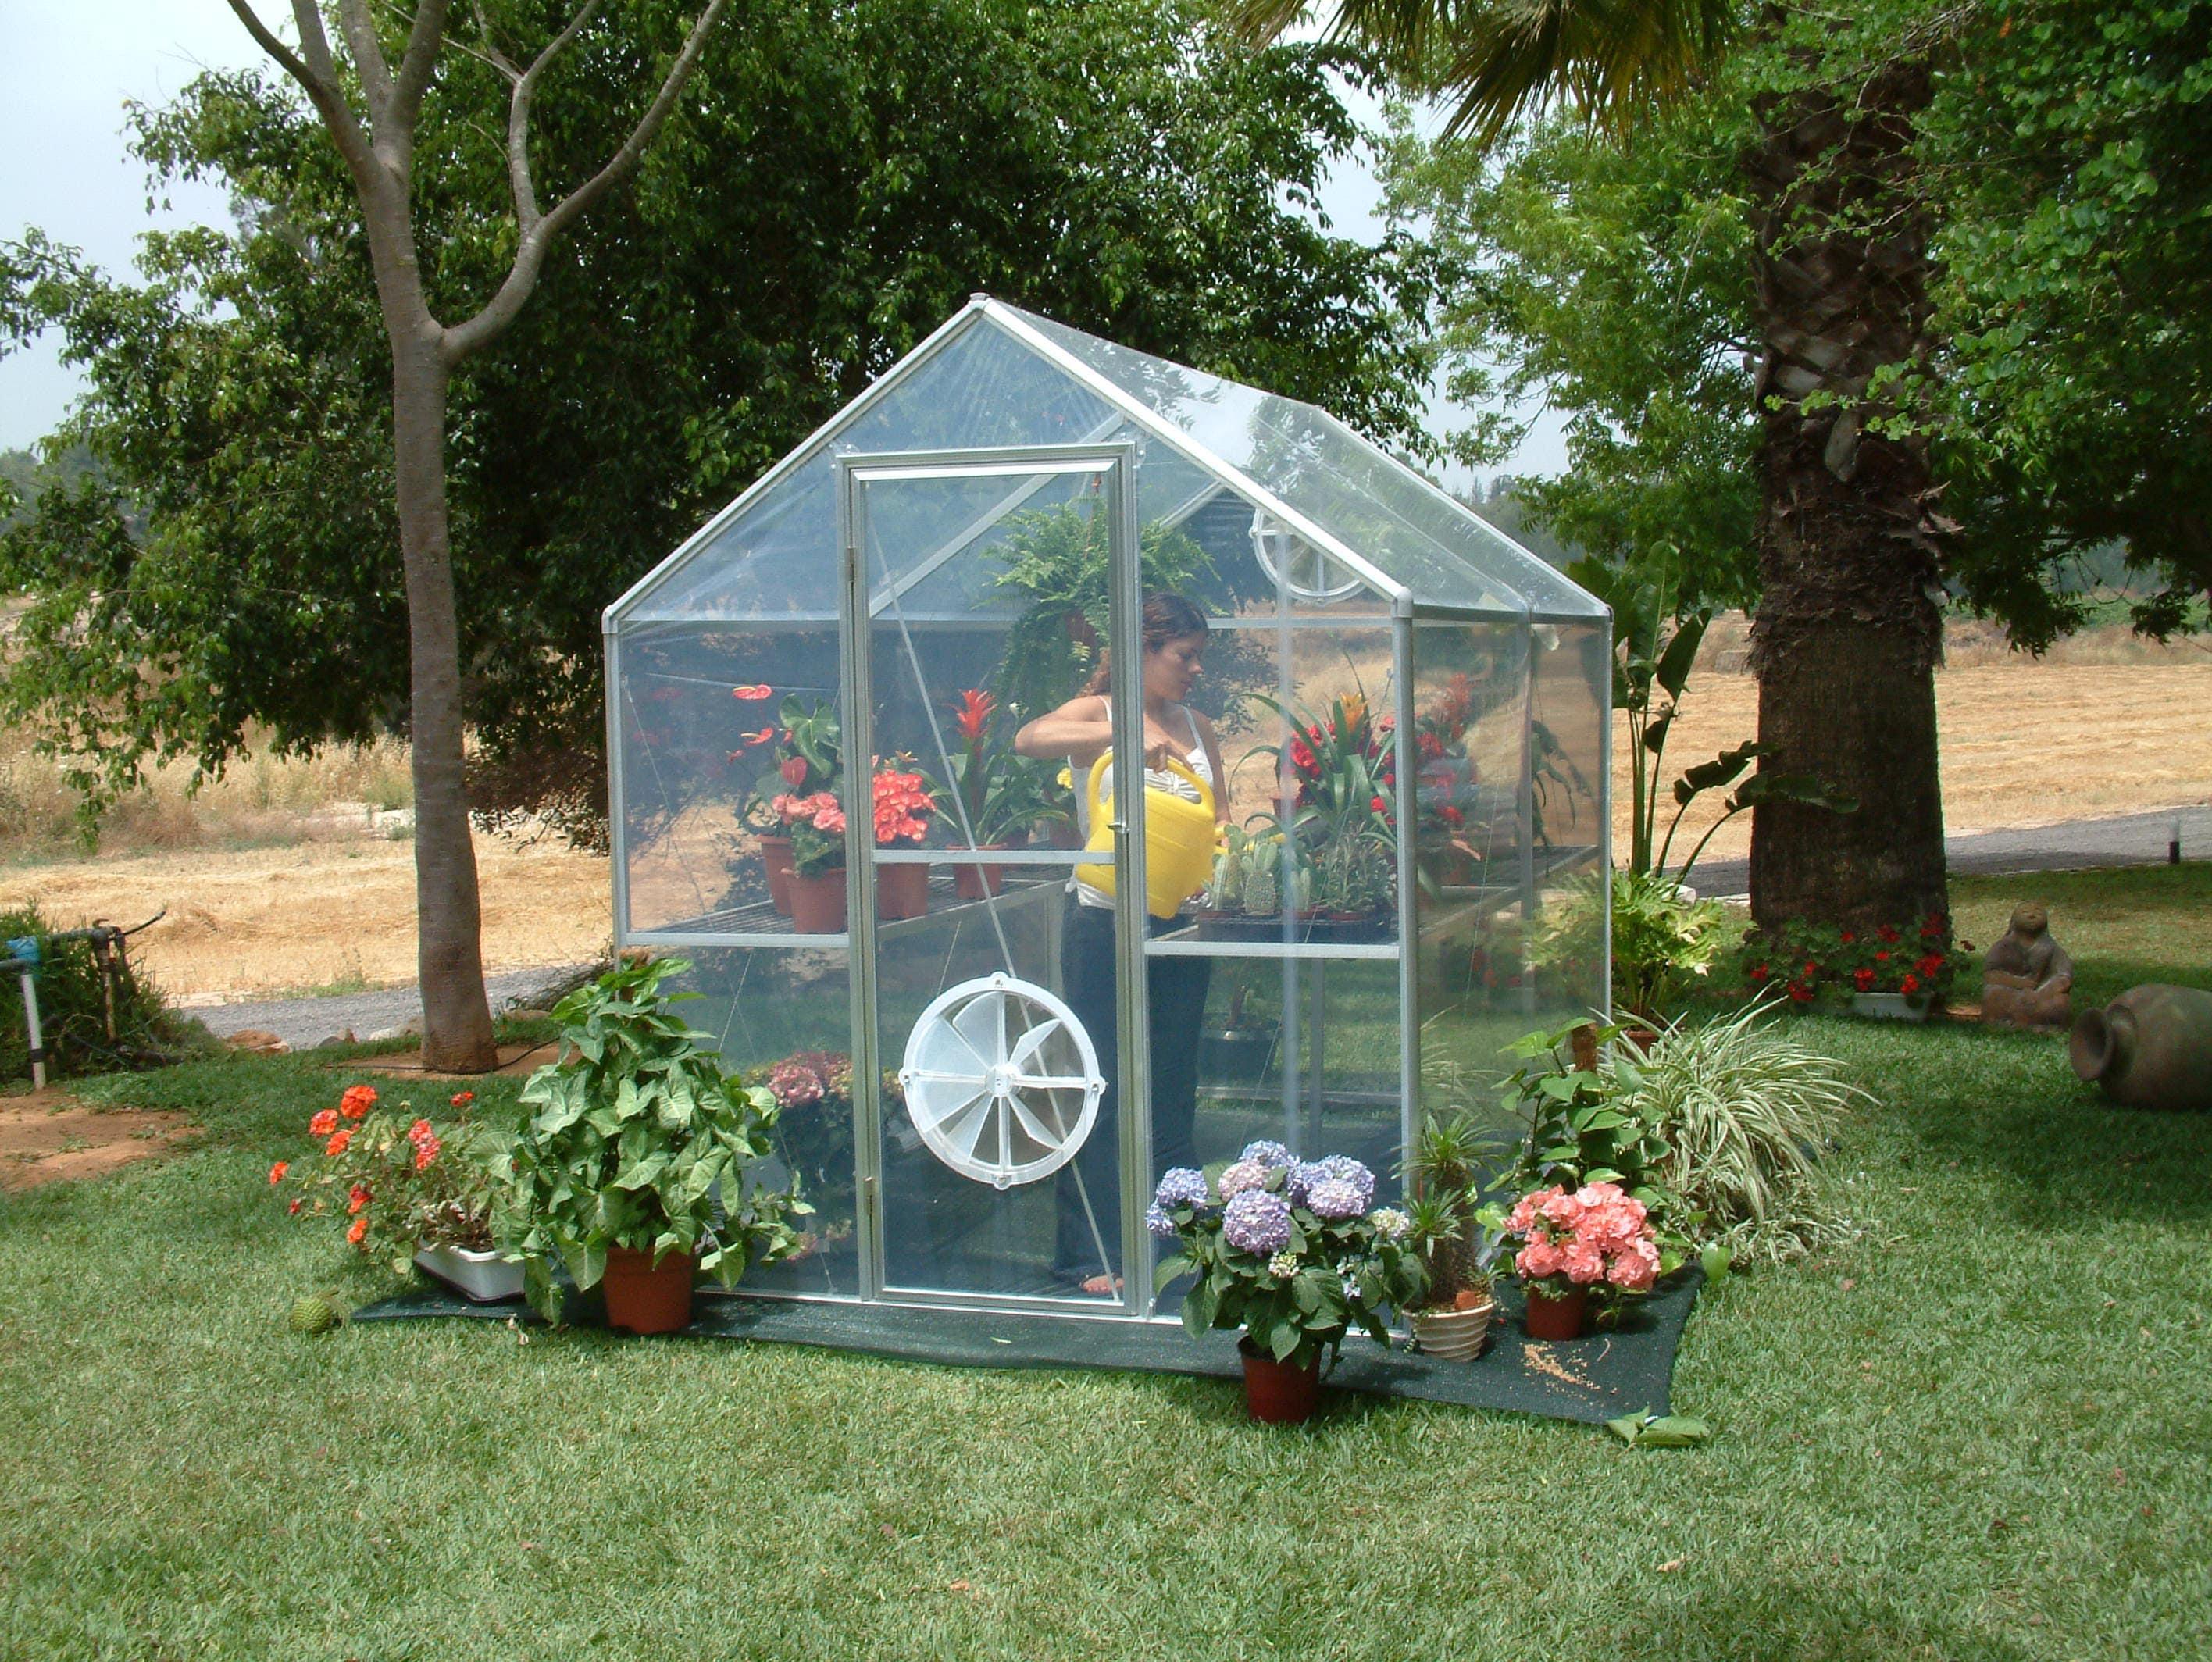 Easy2Build Greenhouse (6' x 10') - Thumbnail 1